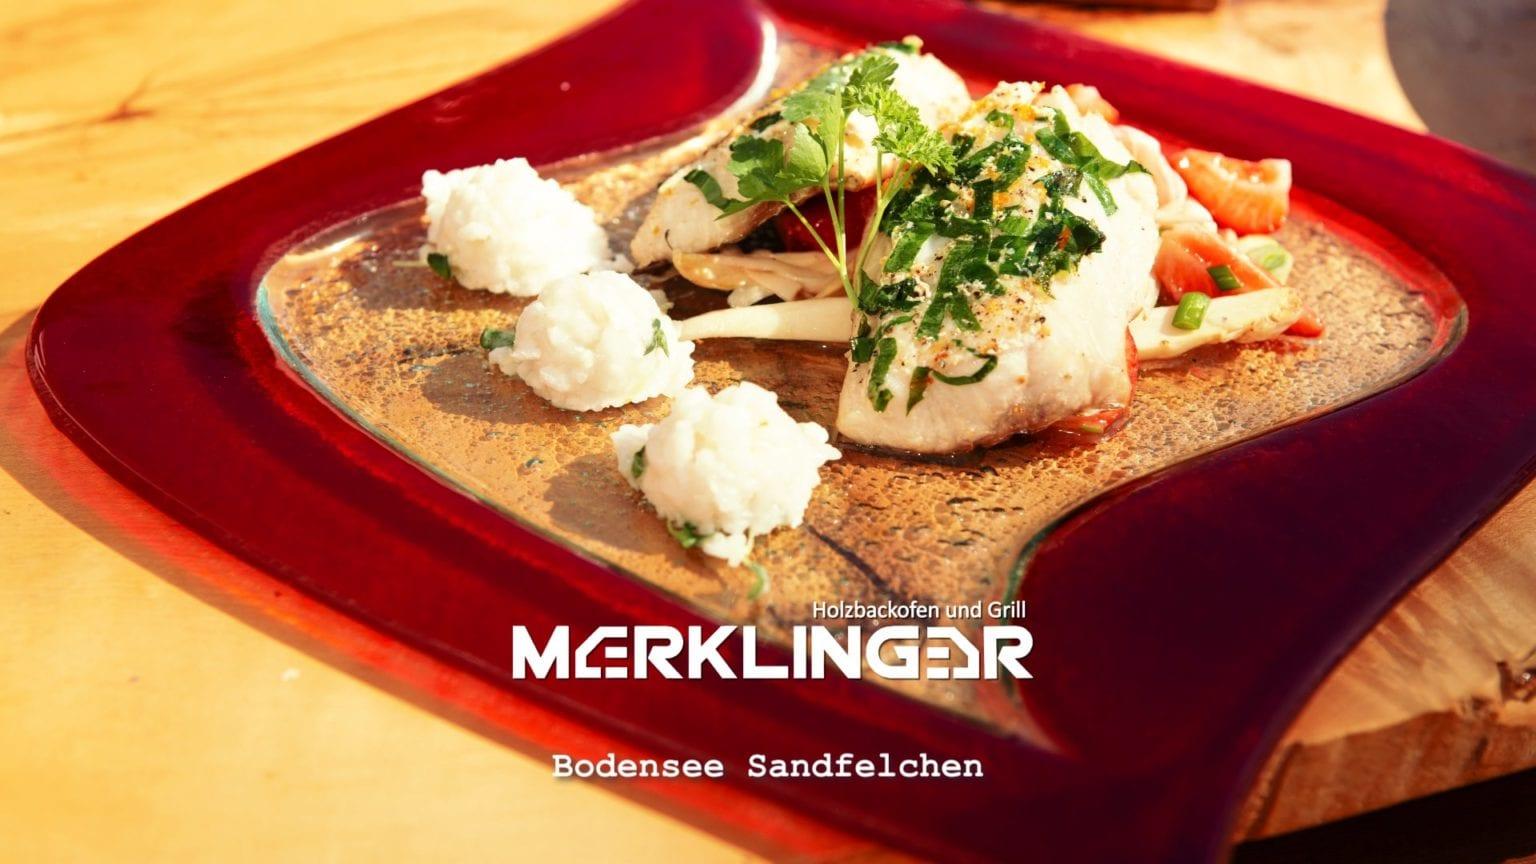 Merklinger Holzbackofen Grill Pizzaofen Brotbackofen Rezept Bodensee Sandfelchen